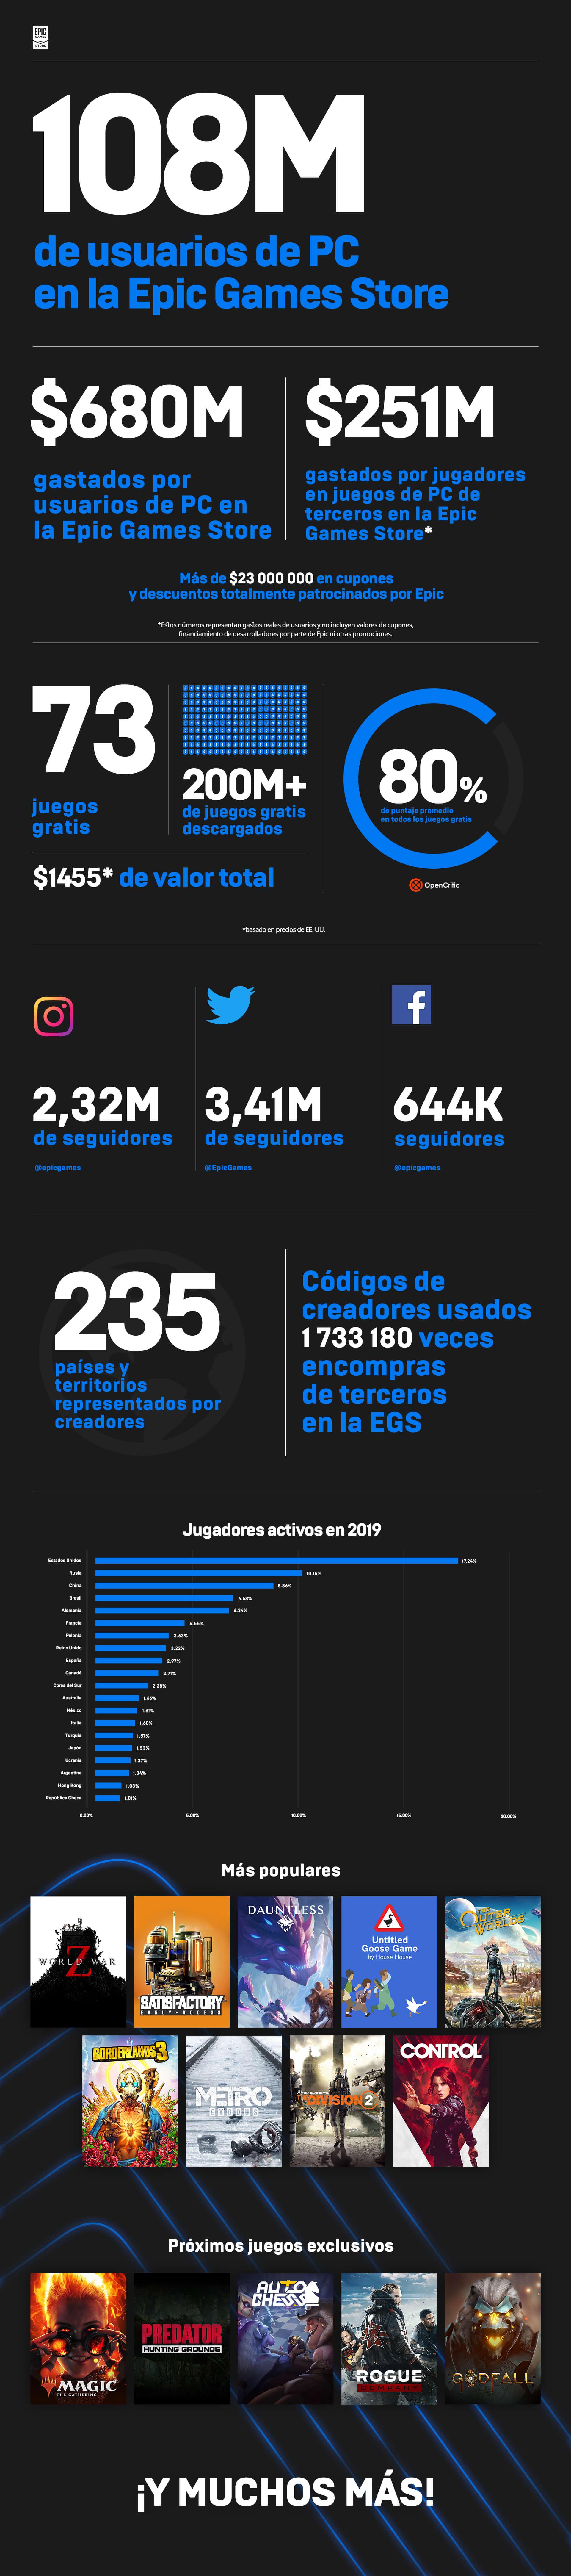 ES_MX_EGS_Infographic.jpg